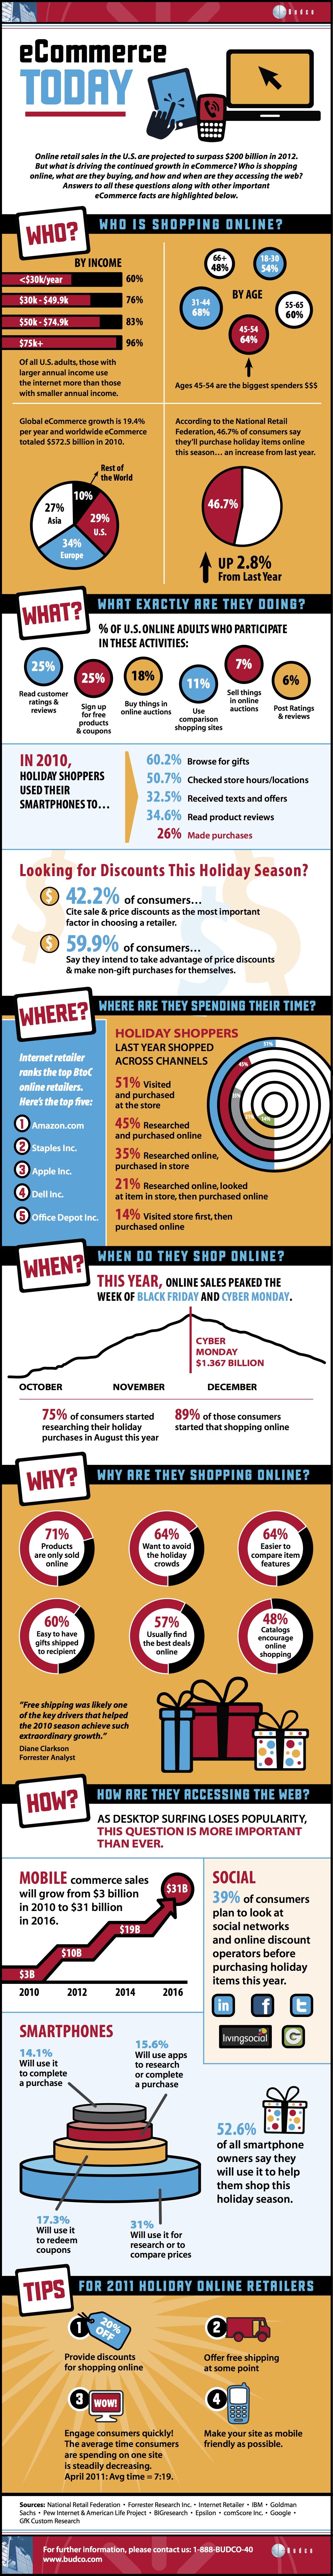 comercio electrónico hoy